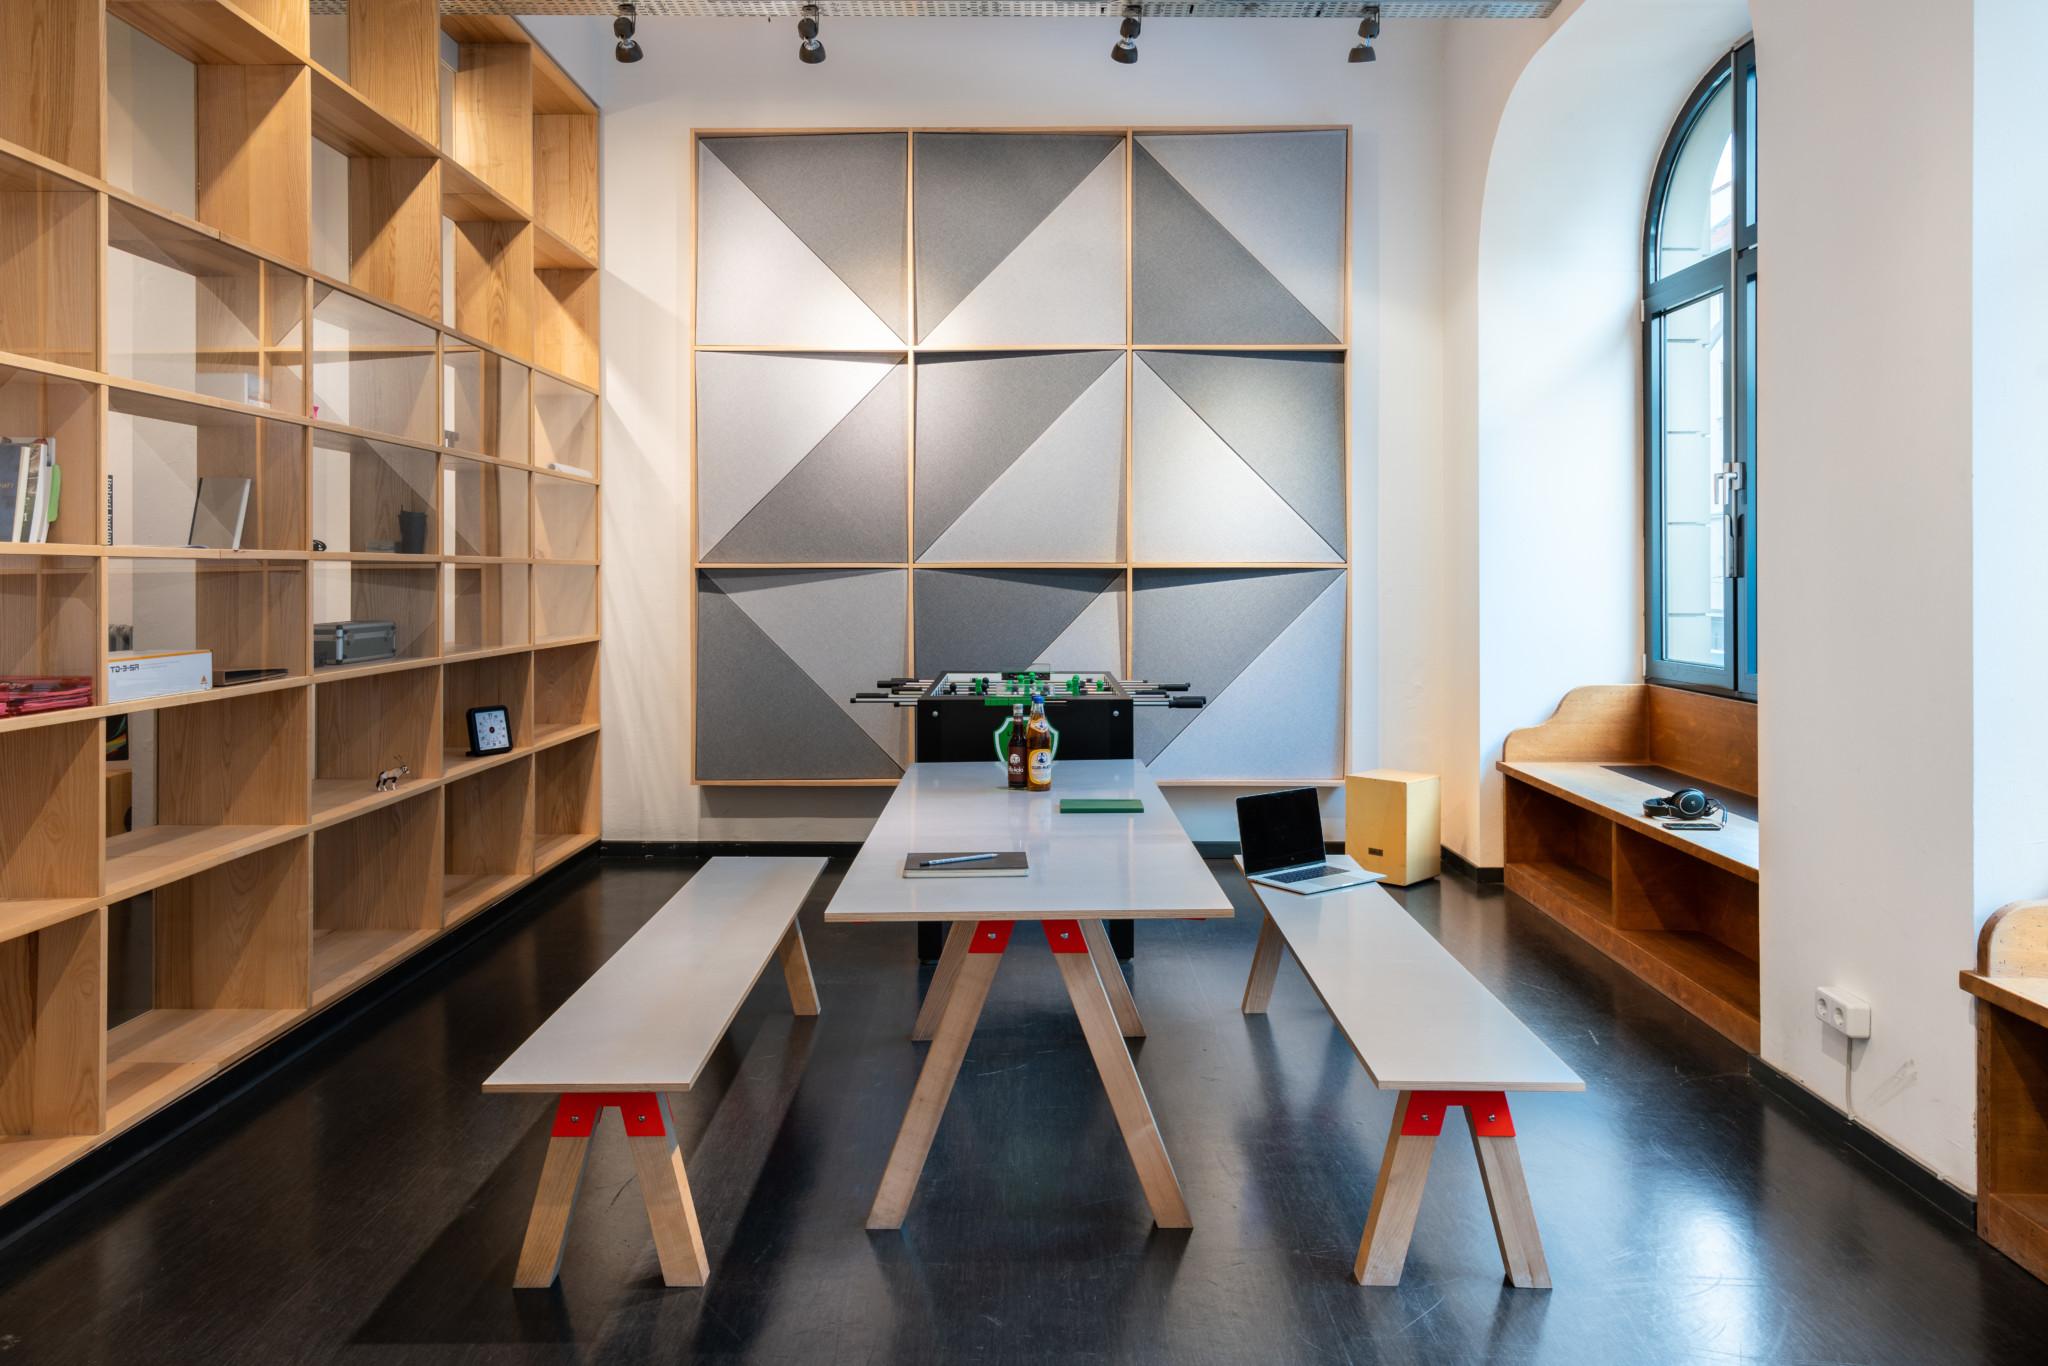 pool22_thomann_factory_office_interior_berlin_03395